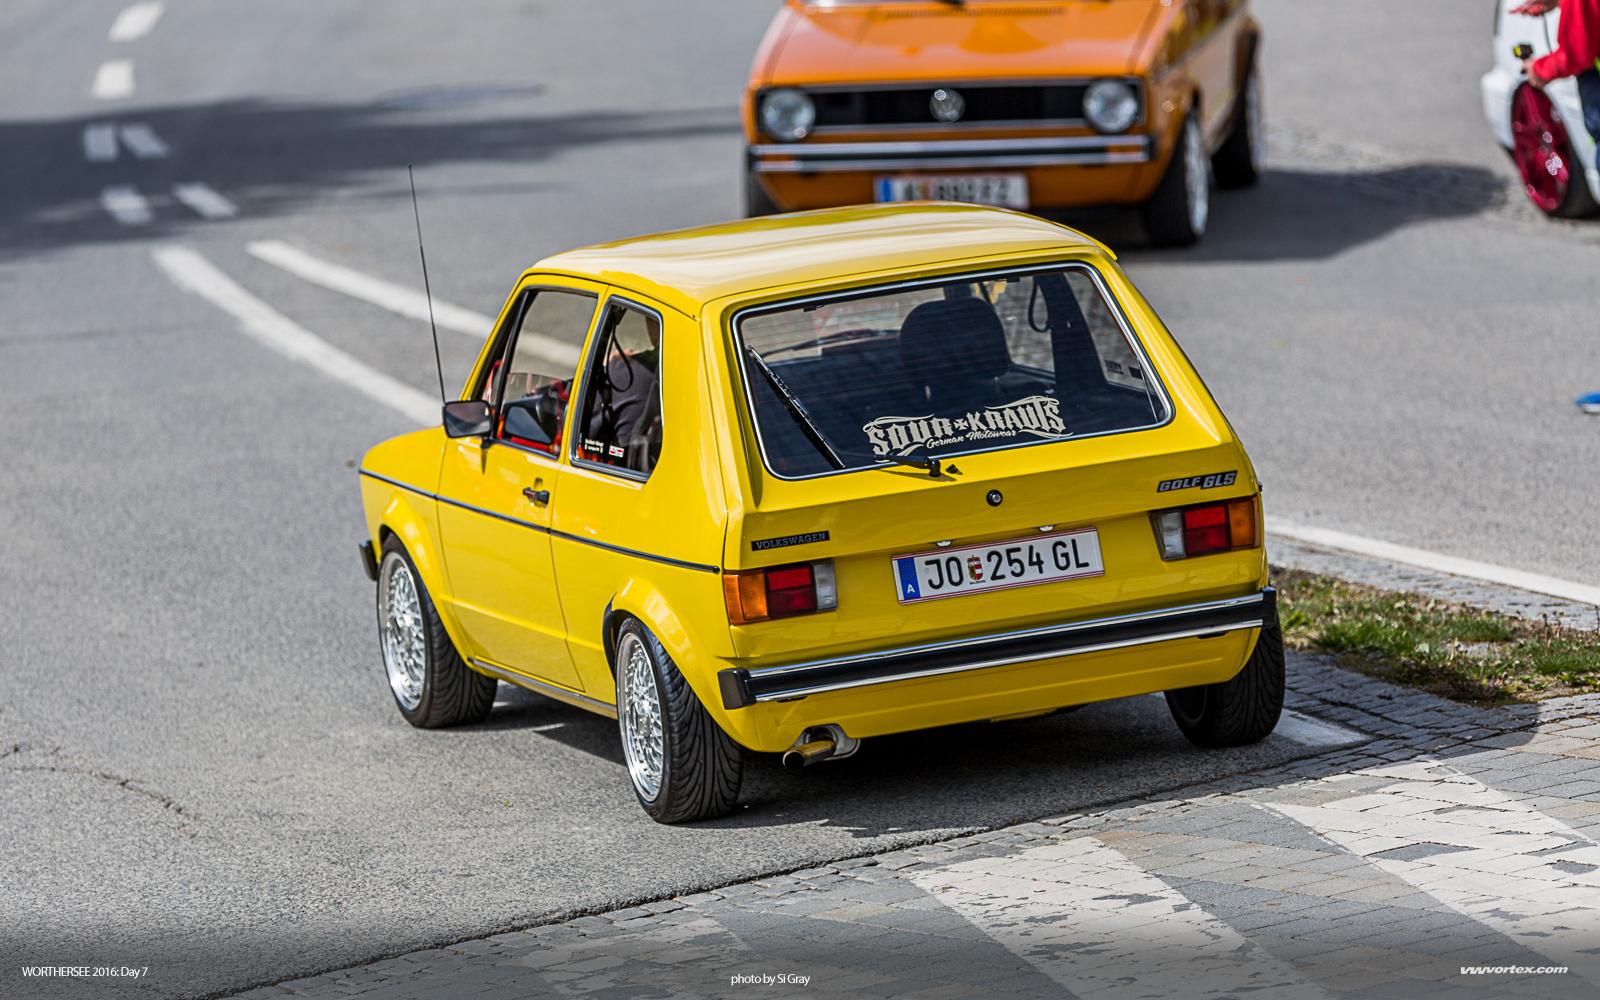 Audi Q8 006 photo